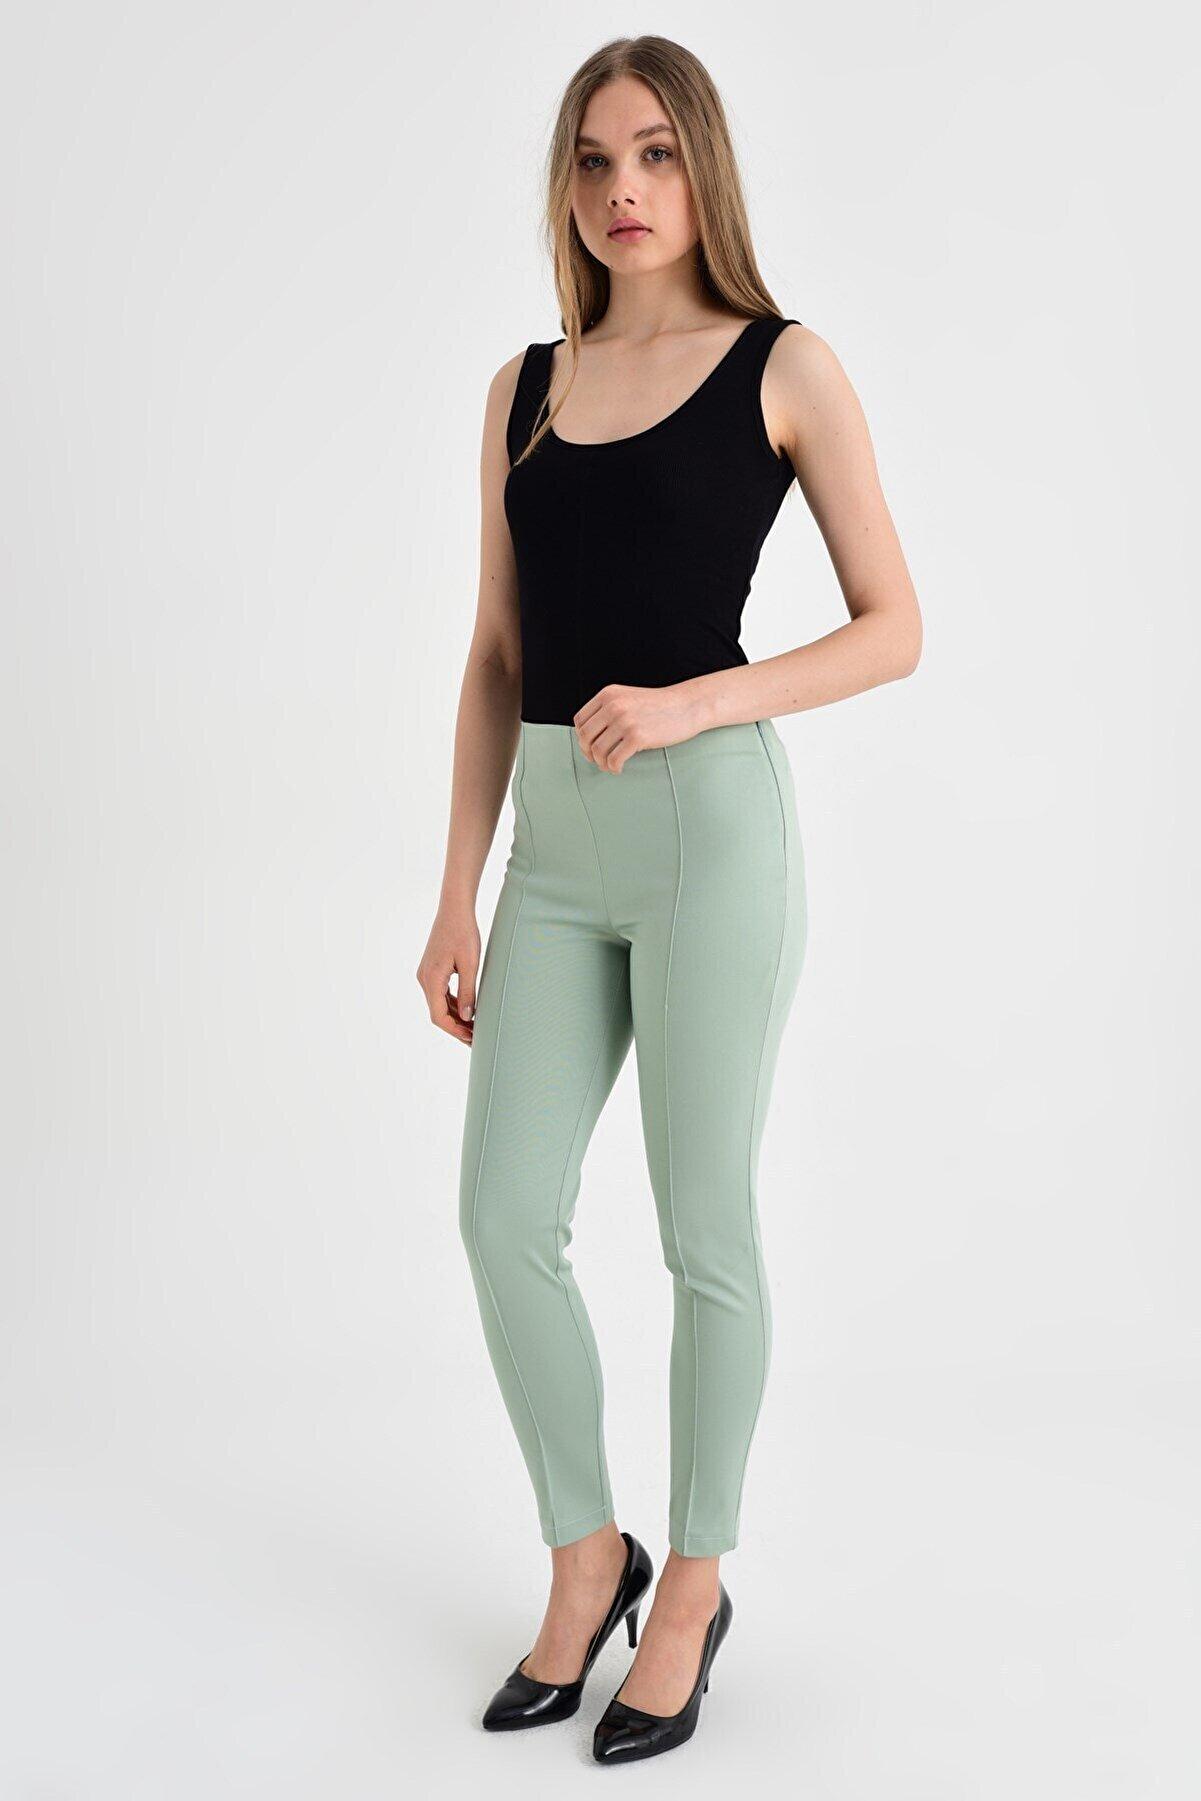 Jument Kadın Mint Pantolon 40004